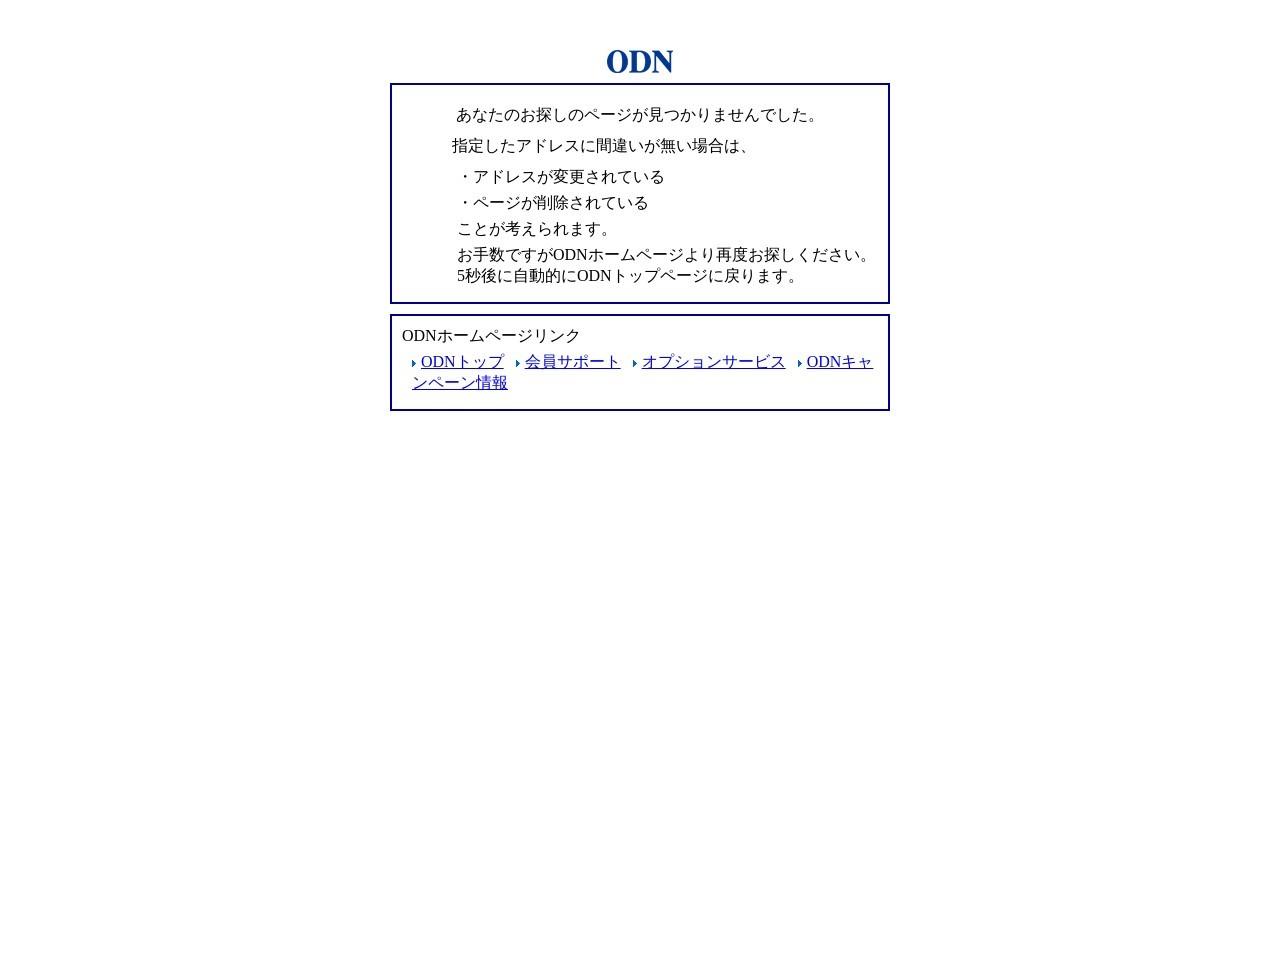 http://www.dts-s.com/rank.cgi?mode=link&id=1991&url=http%3a%2f%2fwww1%2eodn%2ene%2ejp%2f%7eeno%2f